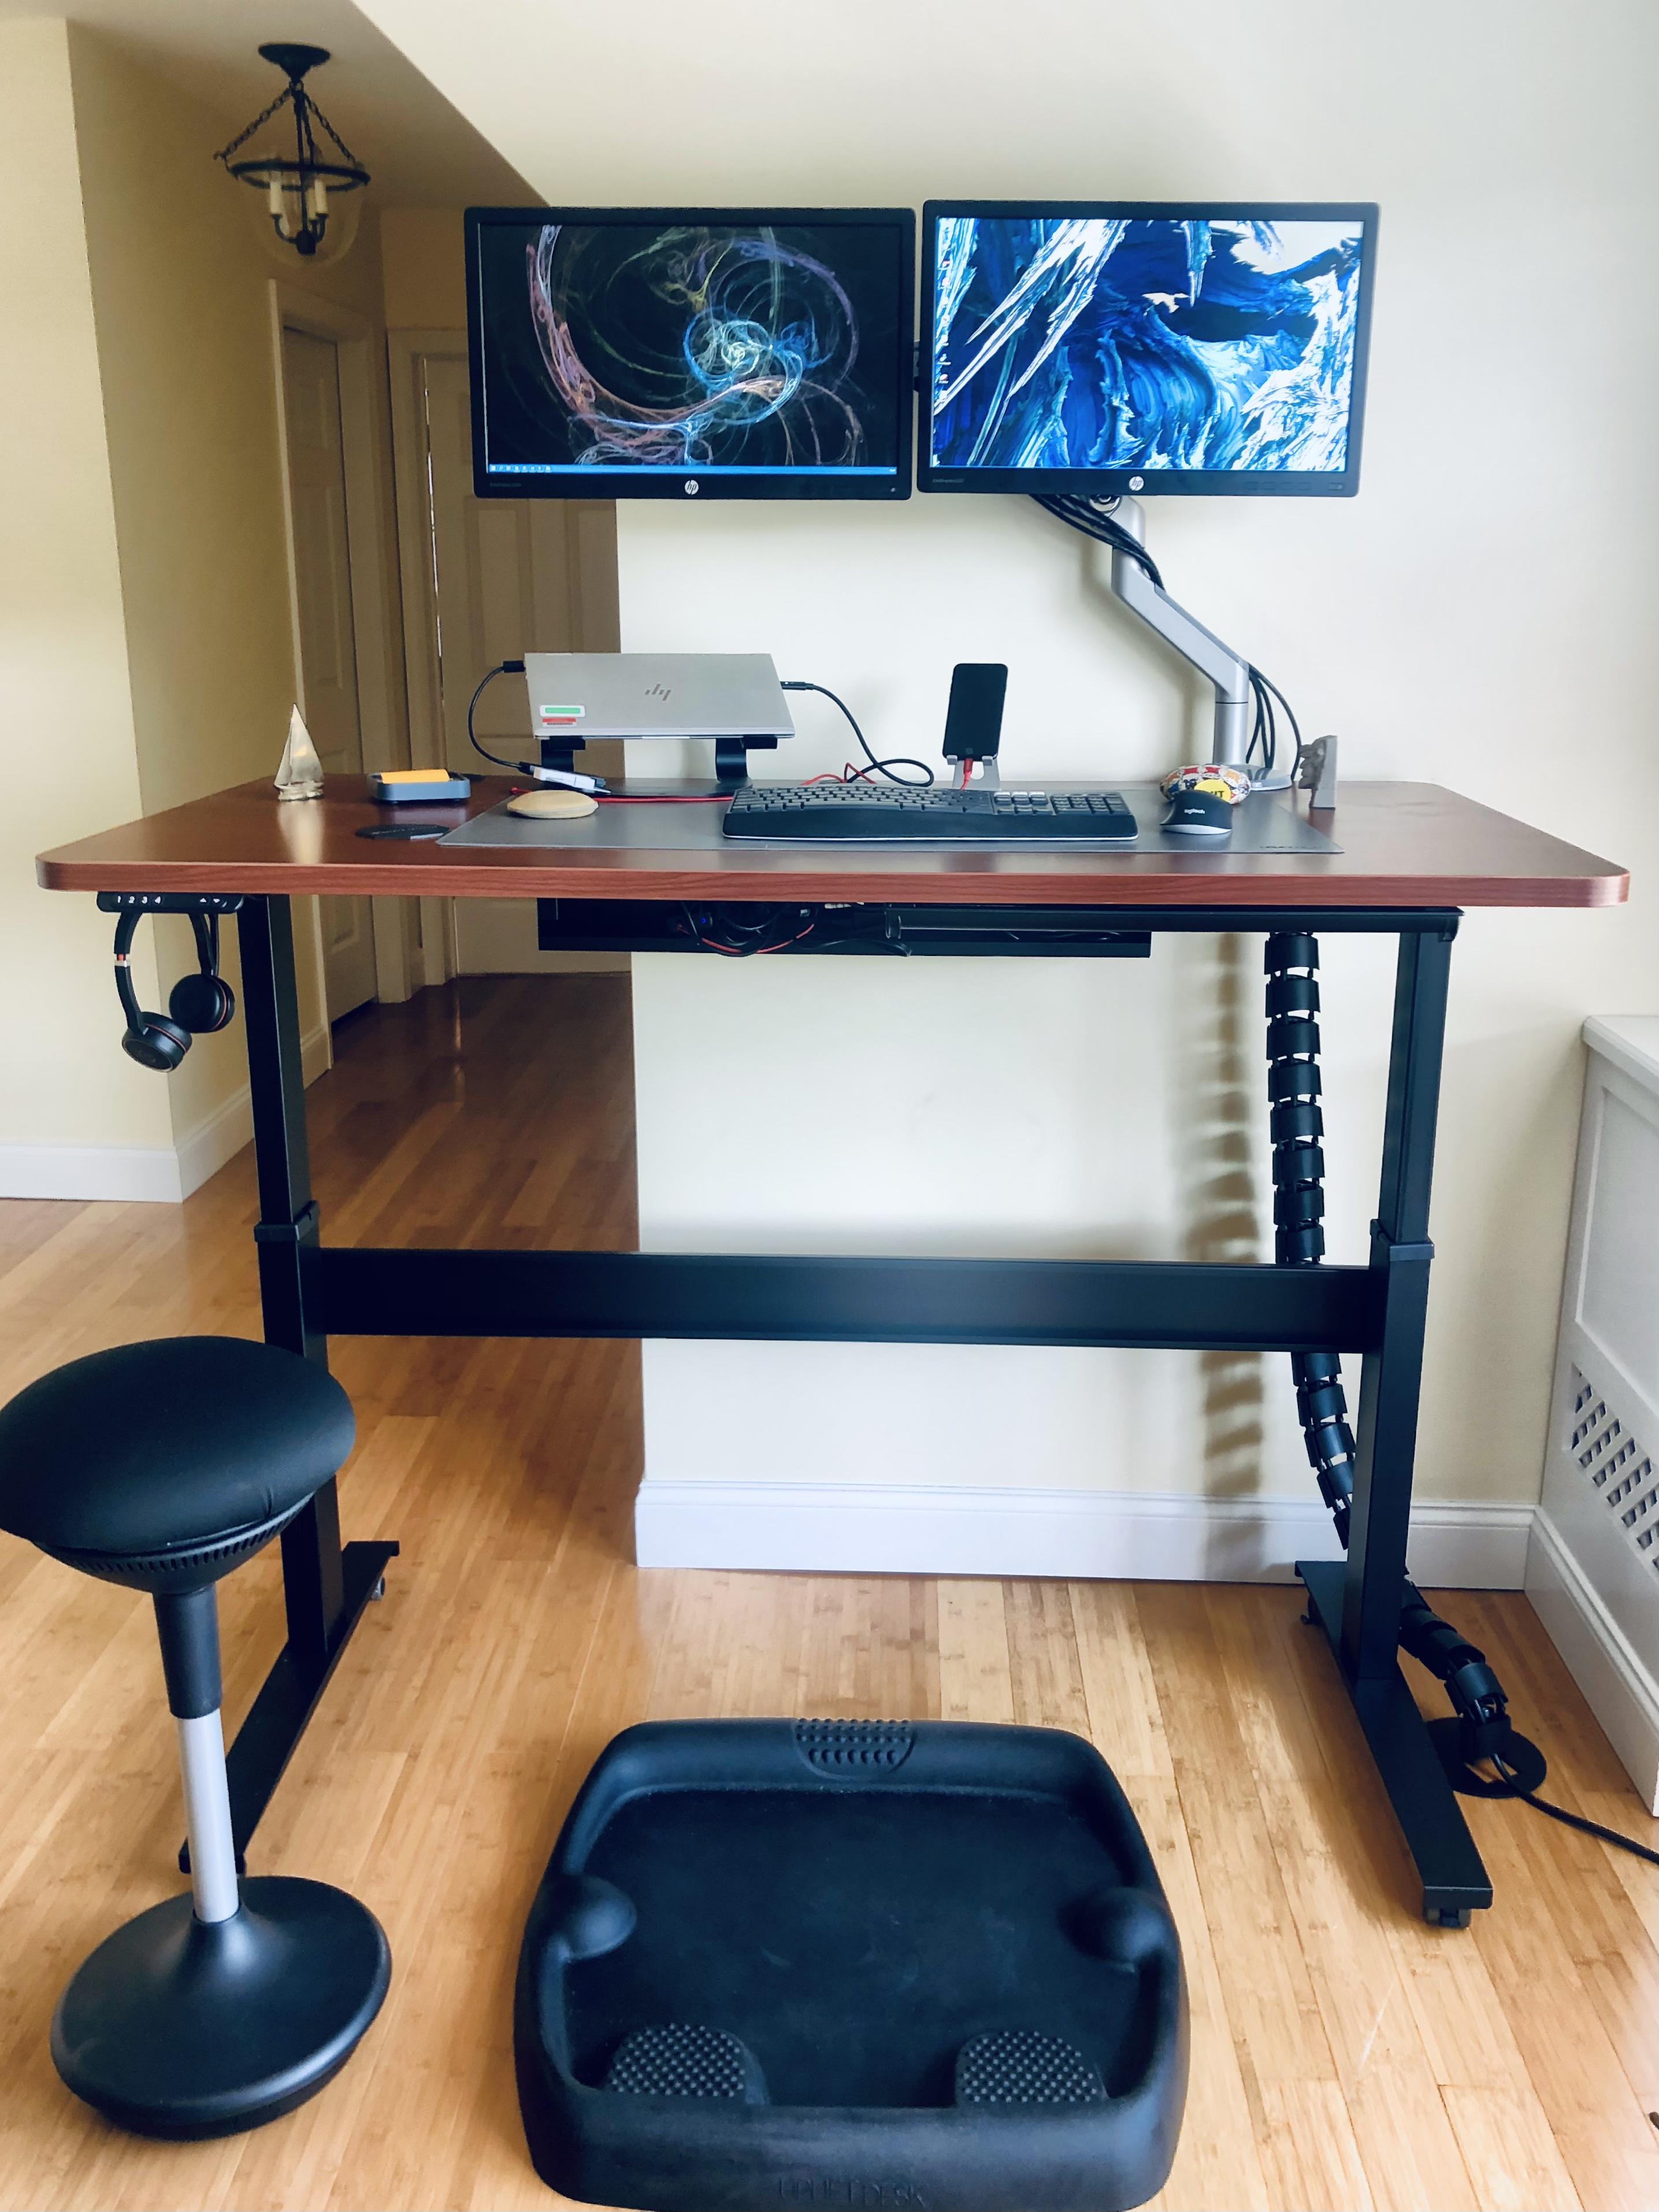 "30"" x 60"" Cherry Rounded Corner Laminate Top with Black VertDesk v3 Adjustable Desk Frame"